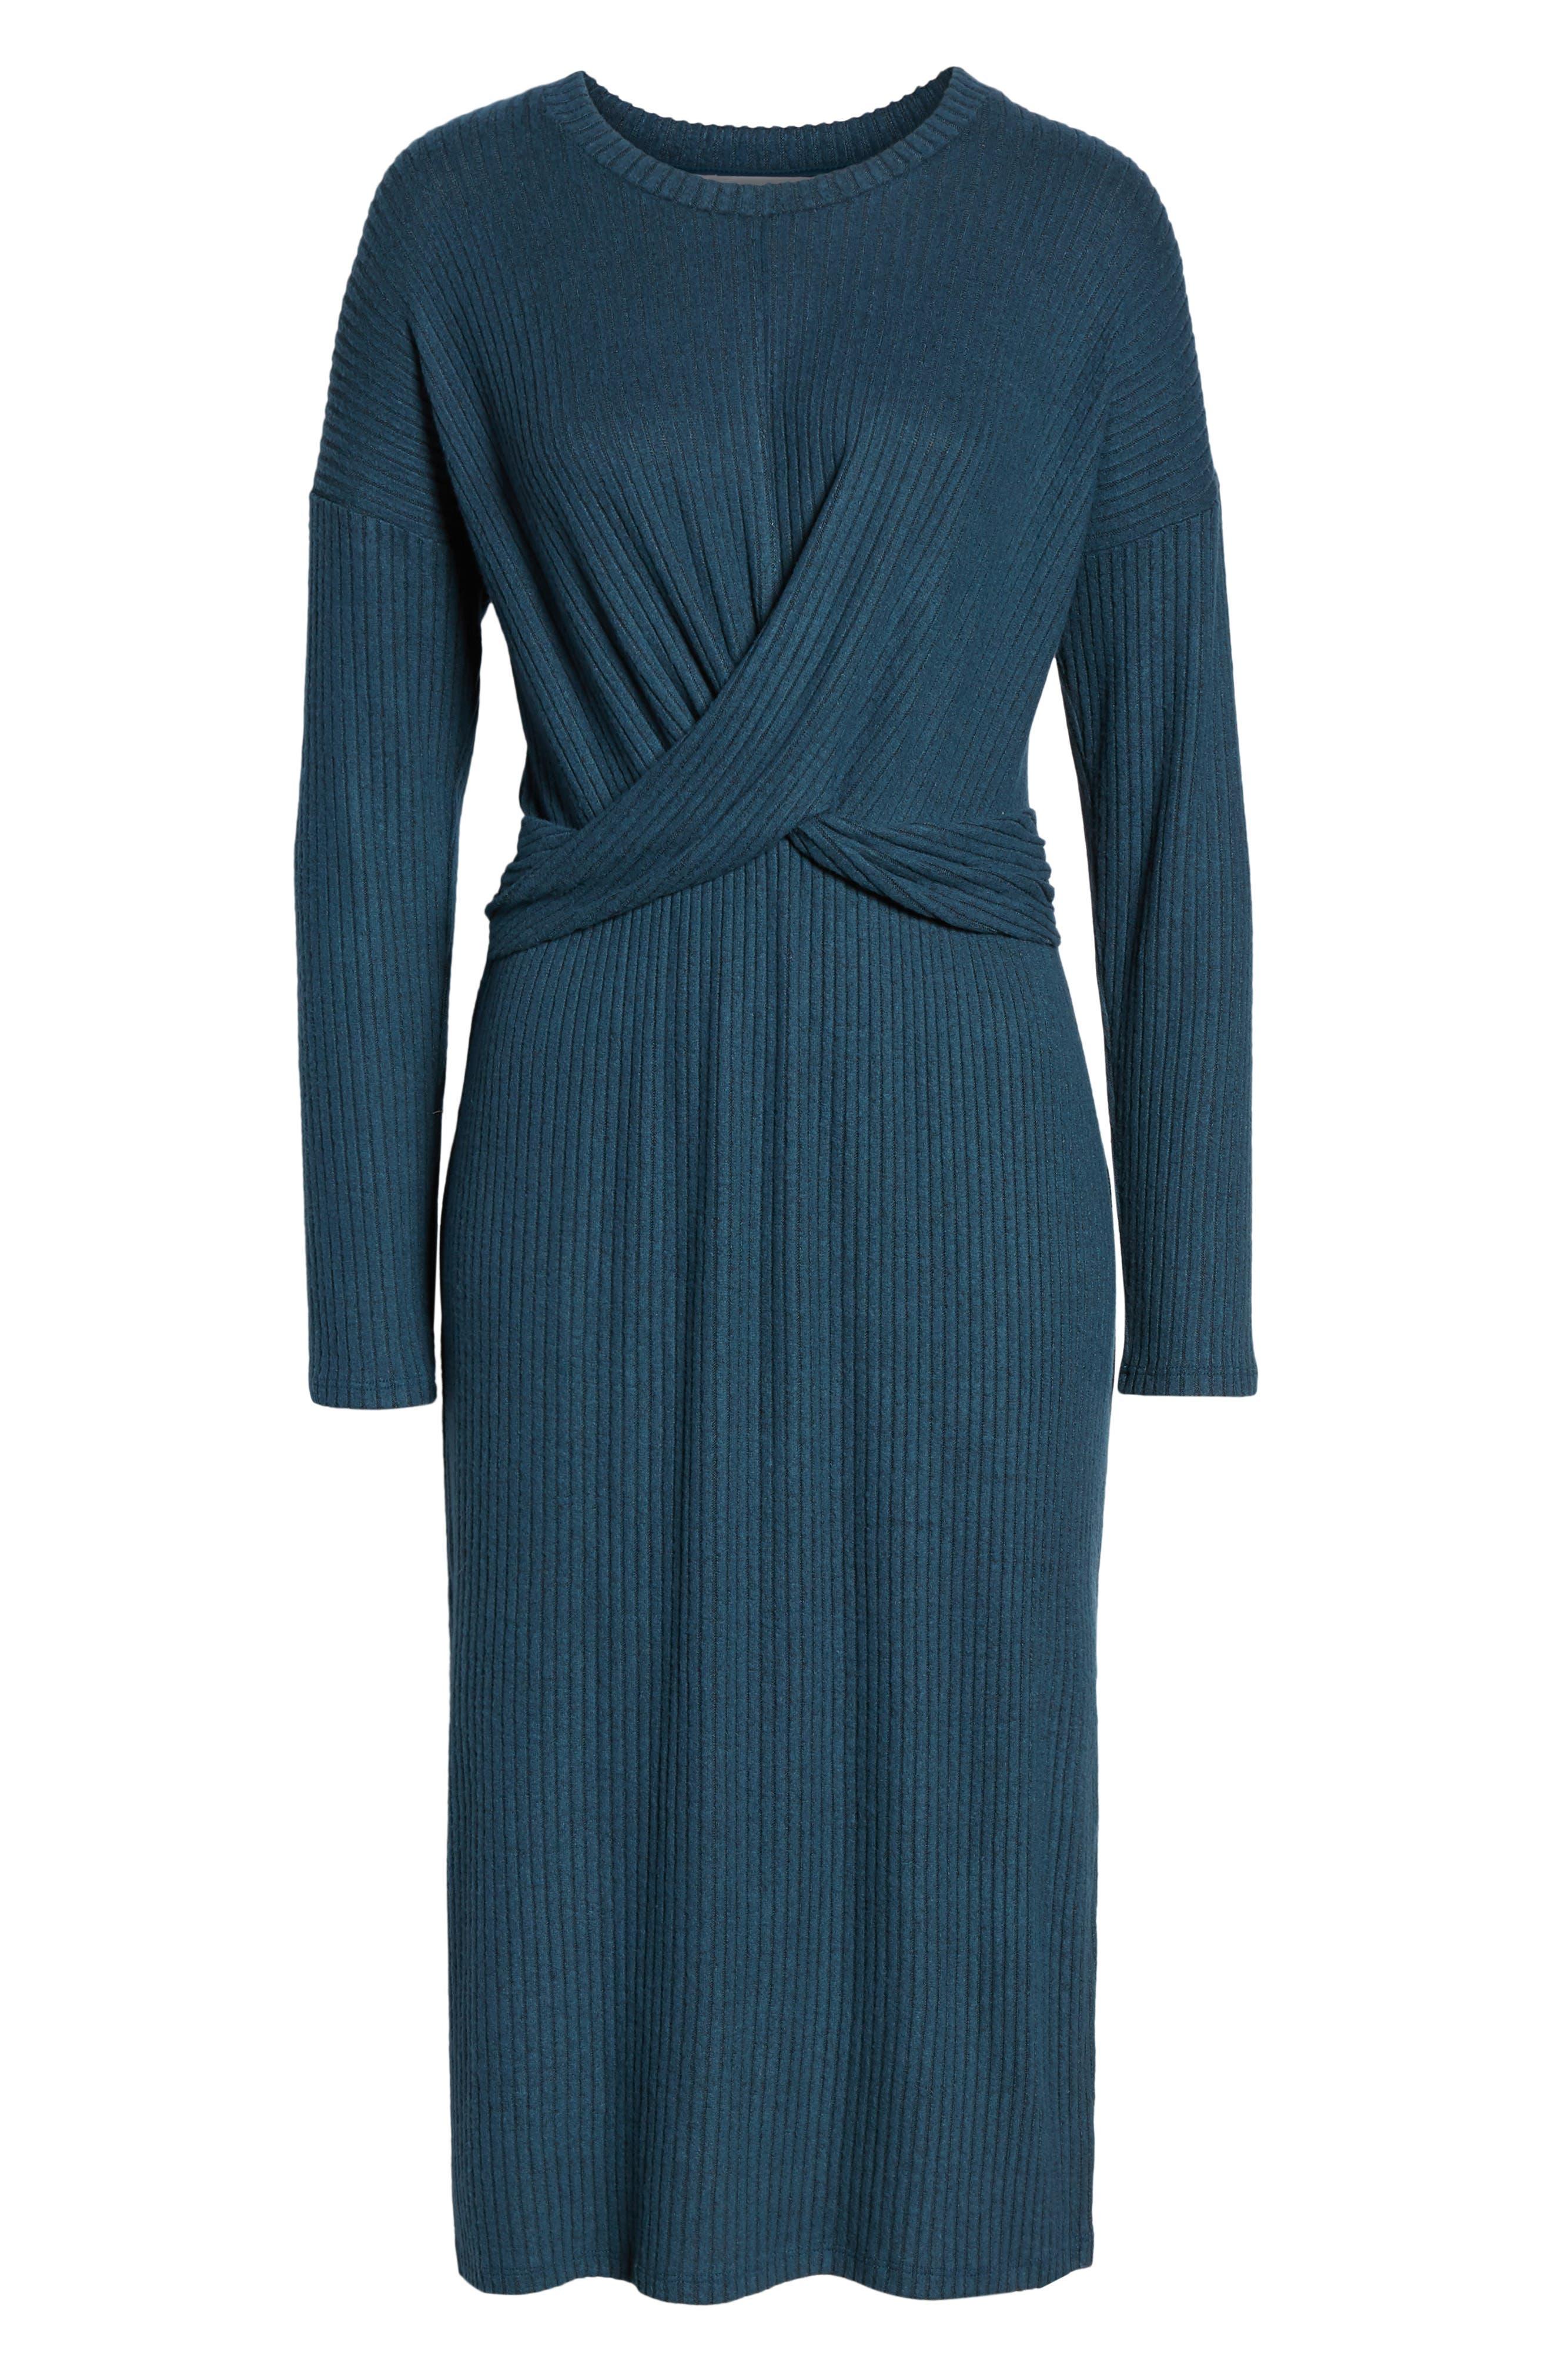 ALL IN FAVOR,                             Rib Knit Midi Dress,                             Alternate thumbnail 7, color,                             MIDNIGHT NAVY